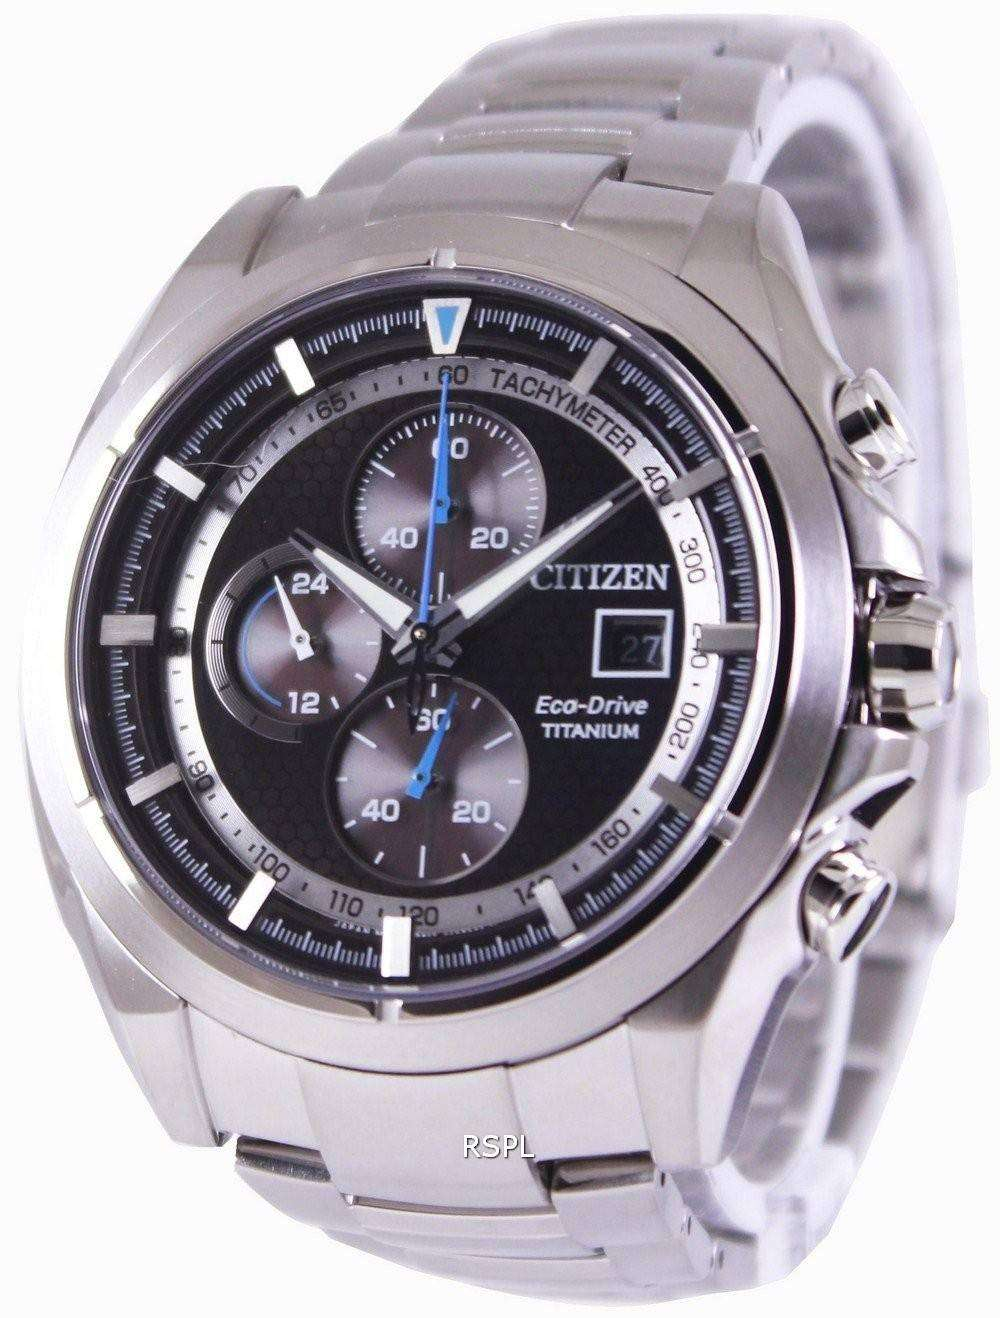 b8f079c776c Citizen Eco-Drive Titanium Chronograph CA0550-52E Mens Watch ...